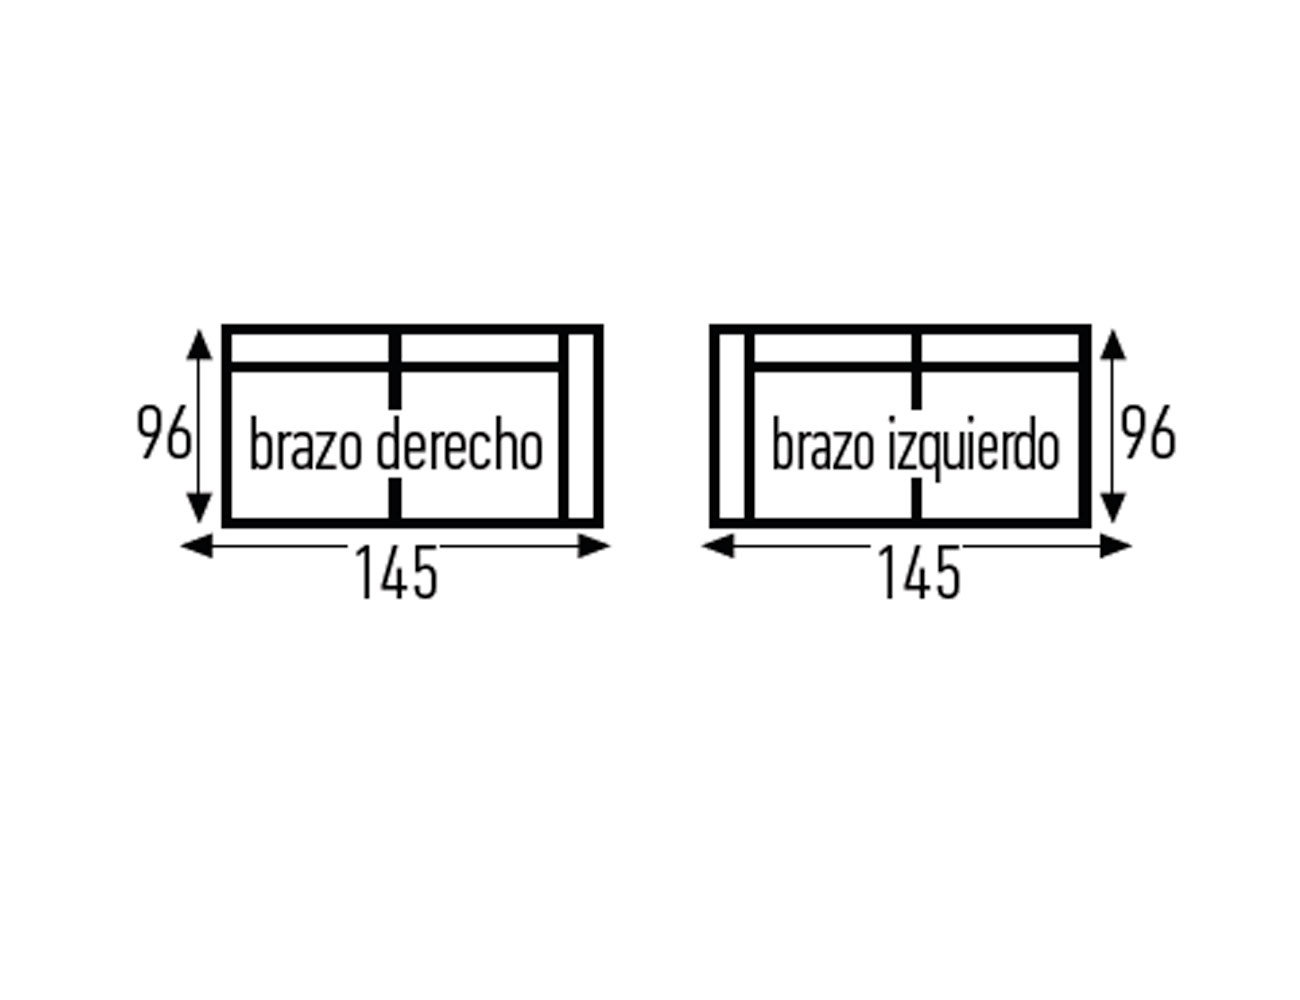 Croquis sofa sin 1 brazo 1457